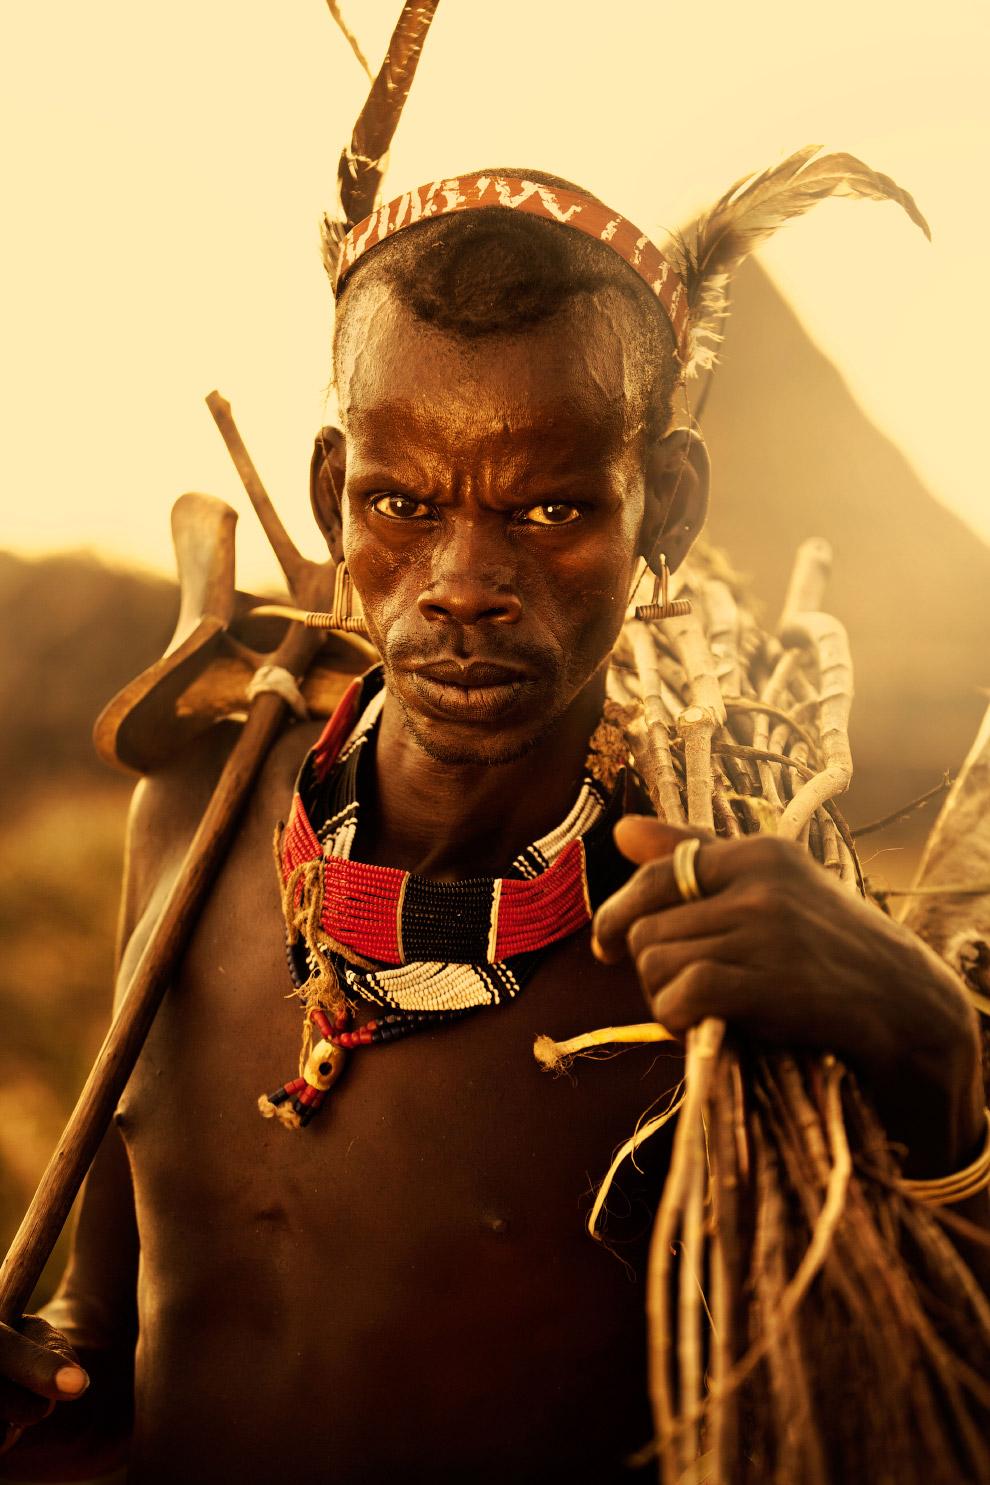 10. Рассвет в пустыне. (Фото Gareth Lowndes, 2015 Sony World Photography Awards):